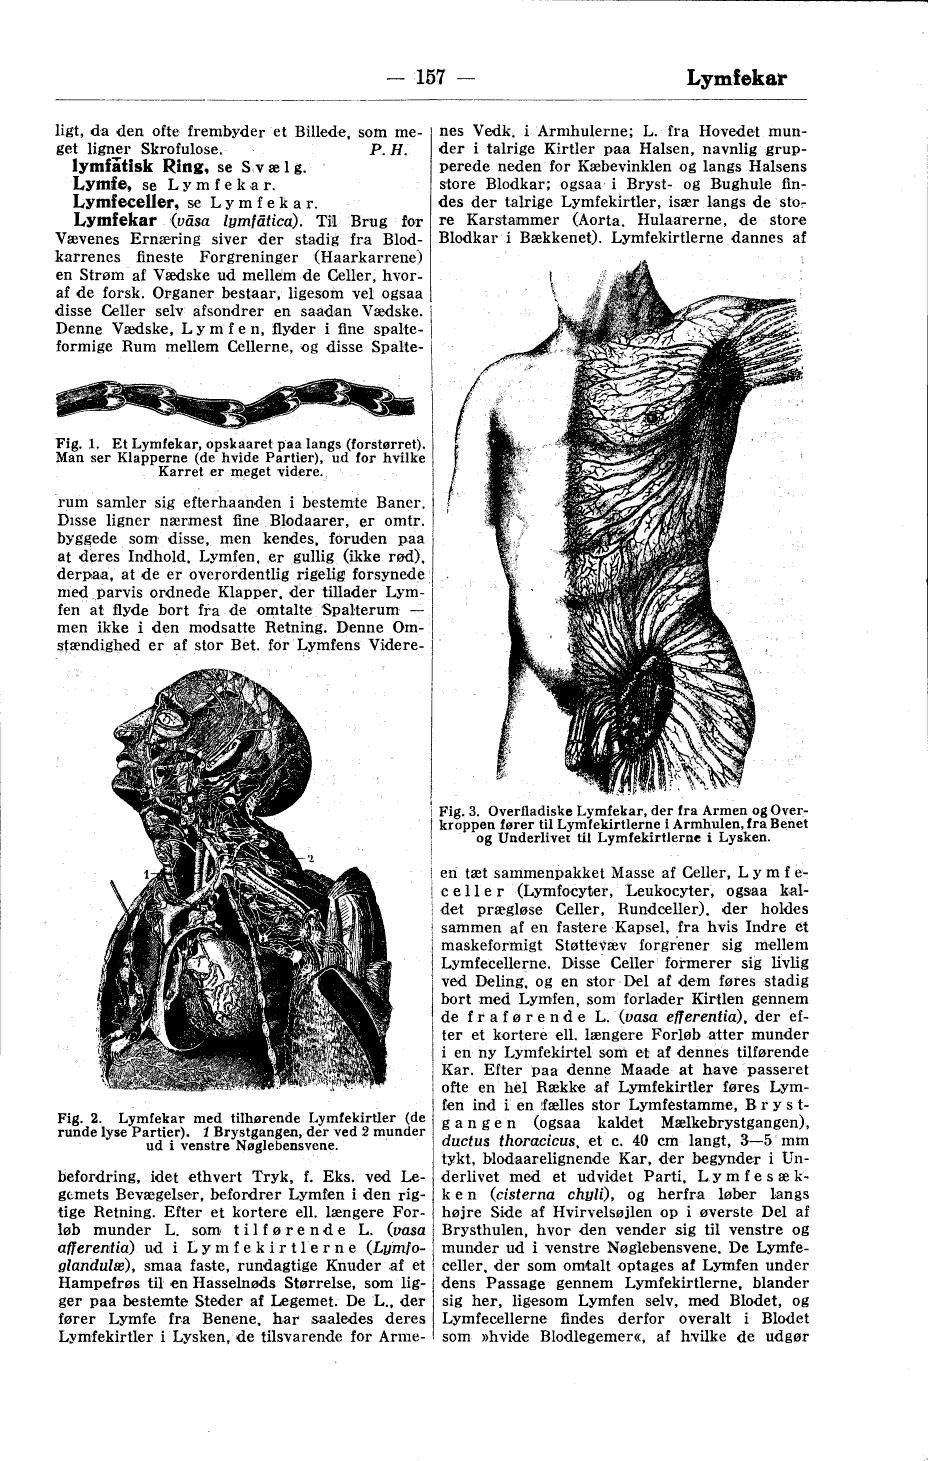 lymfekirtler under armen